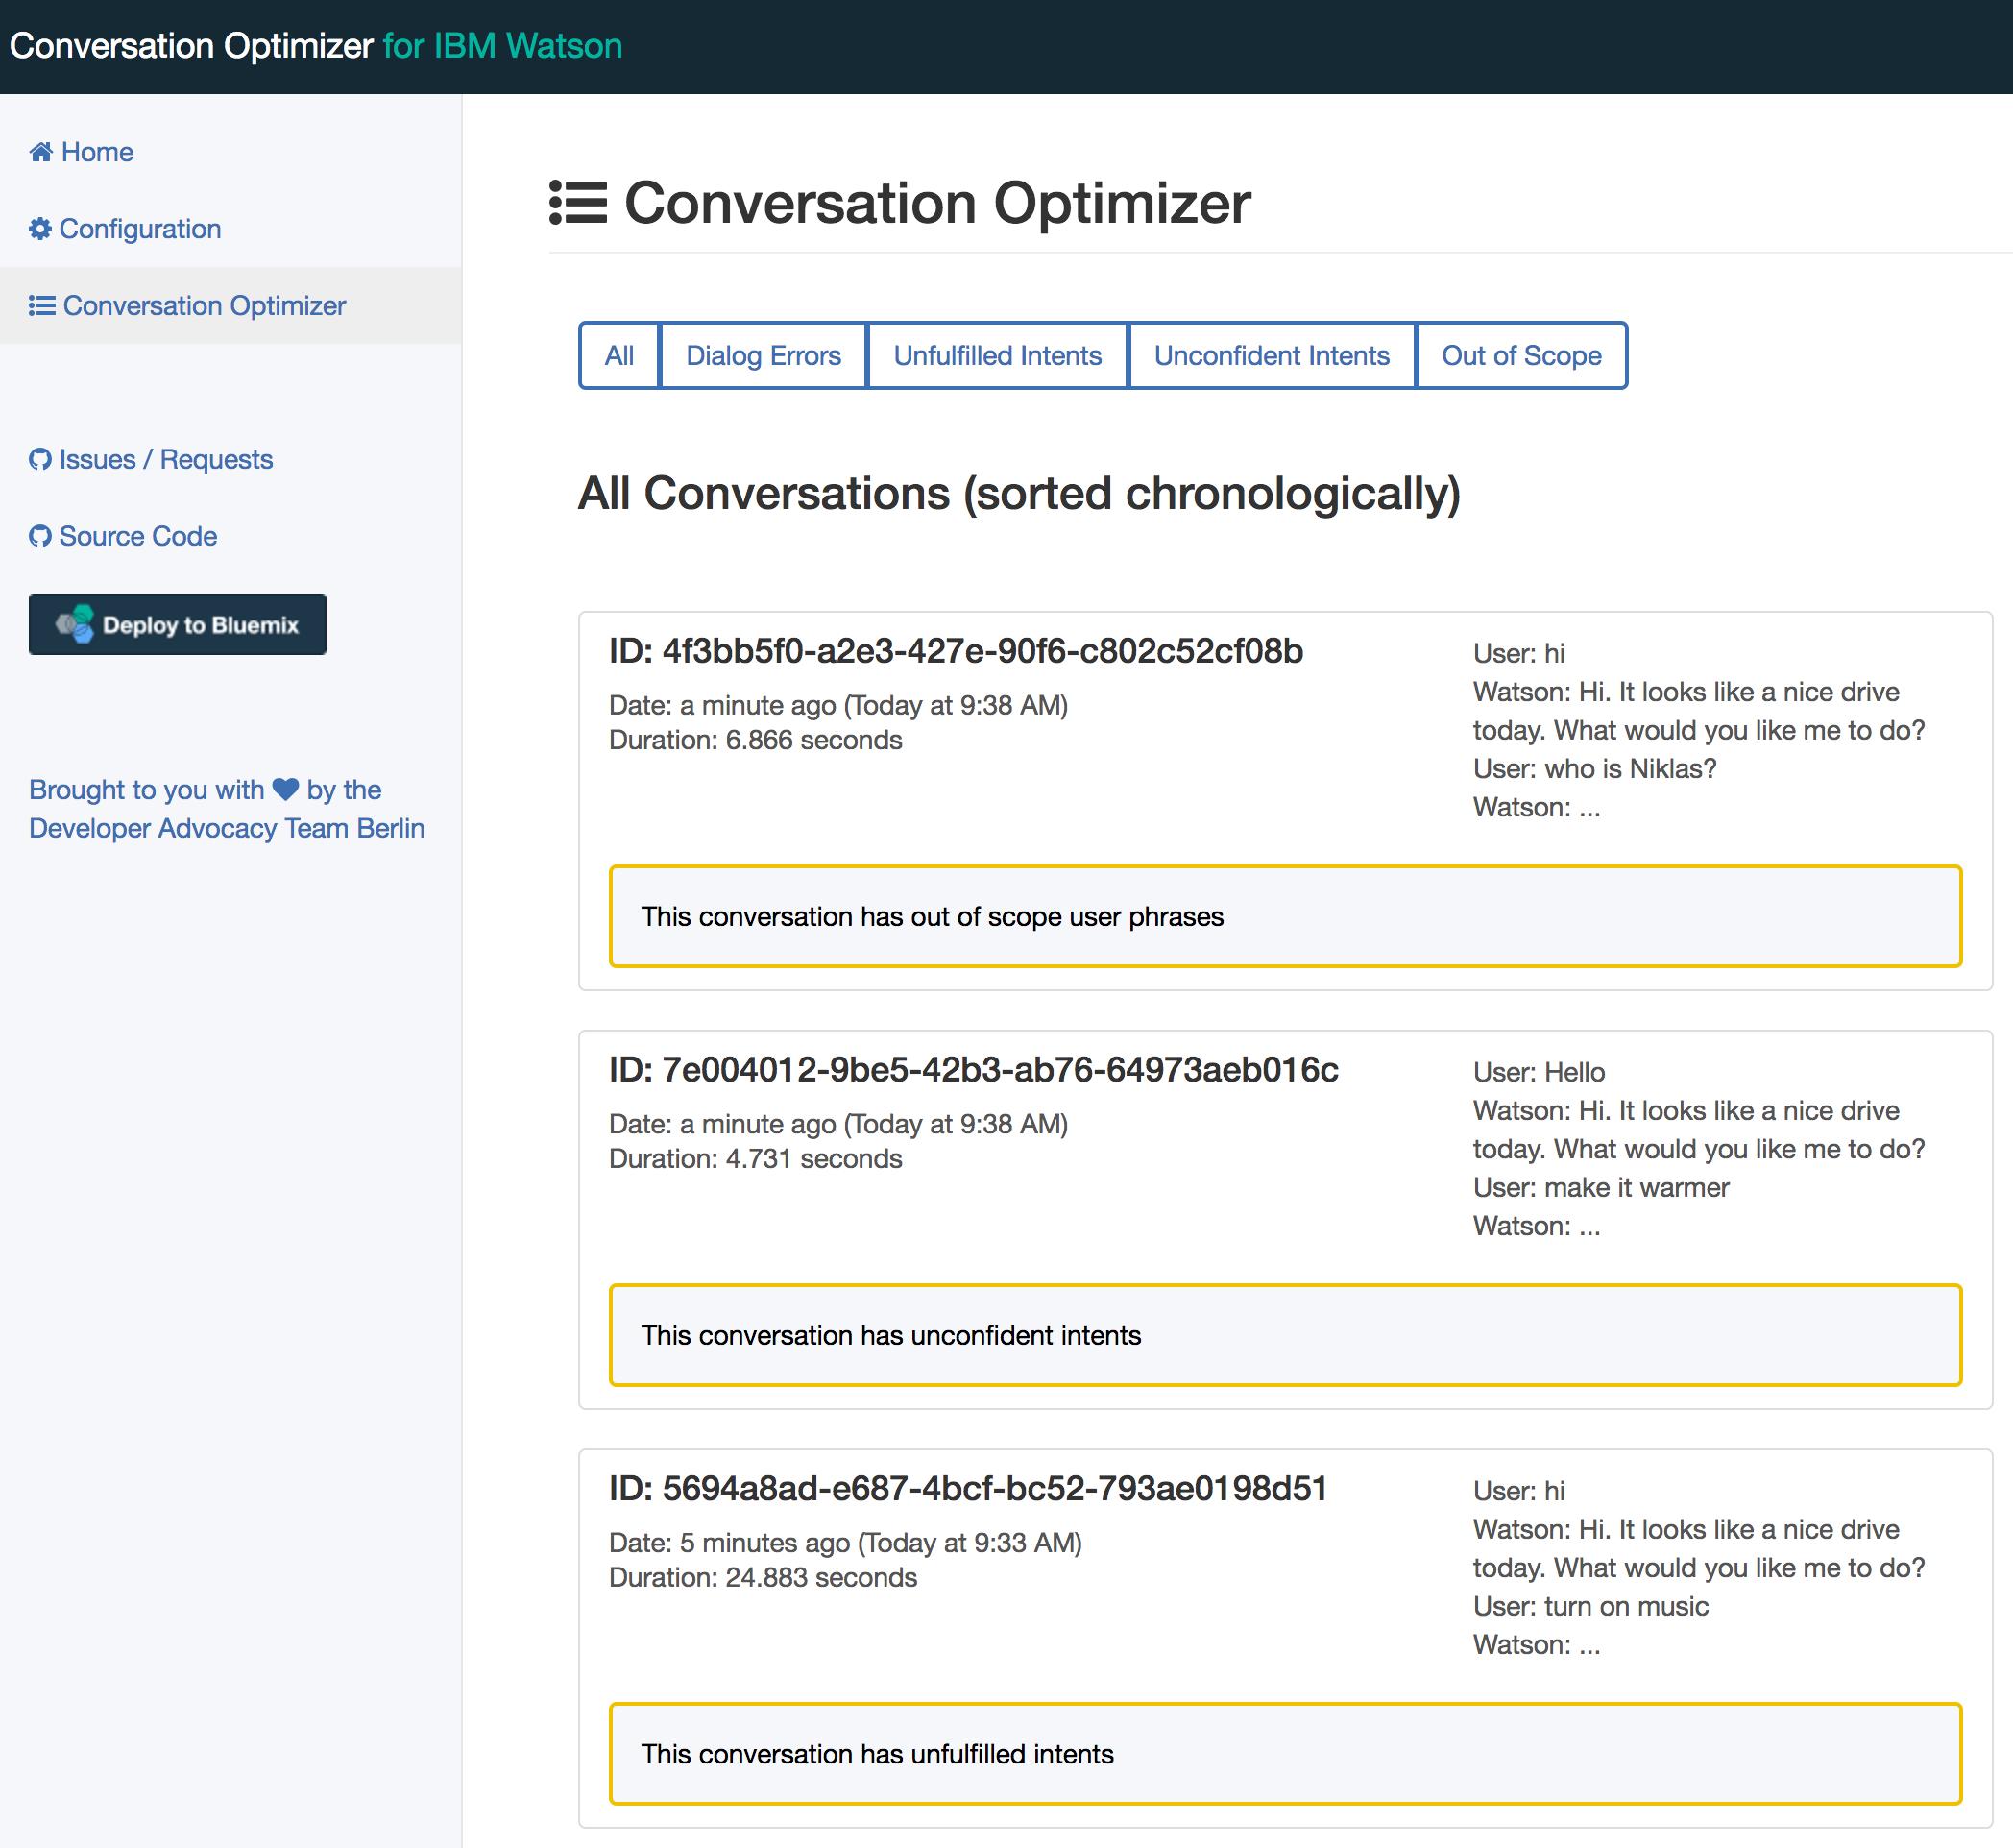 Conversation Optimizer for IBM Watson